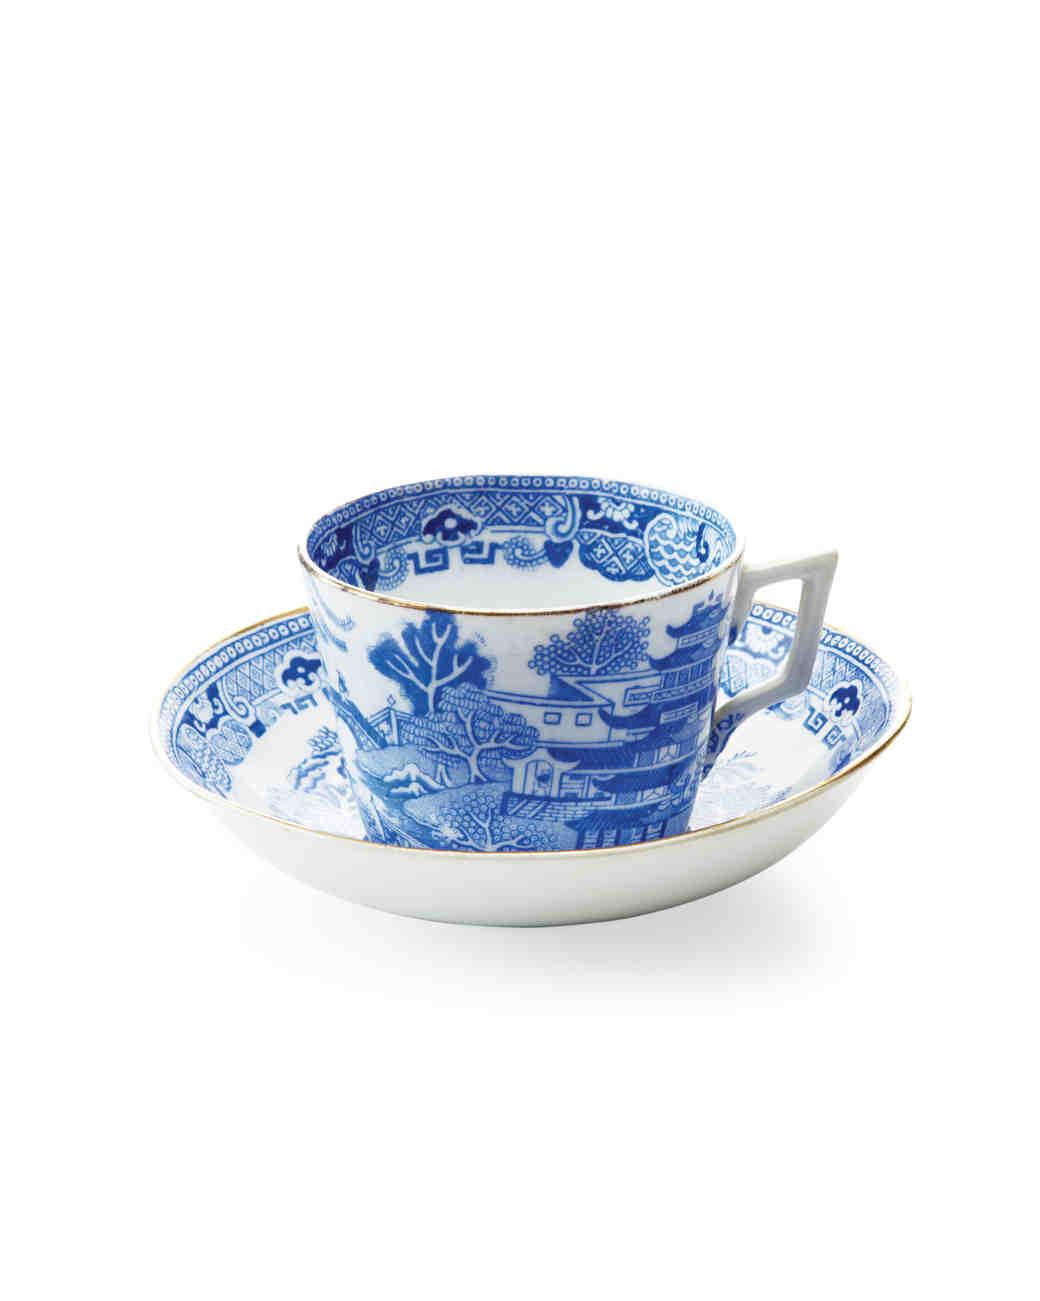 handmade-teacup-mwd108533.jpg